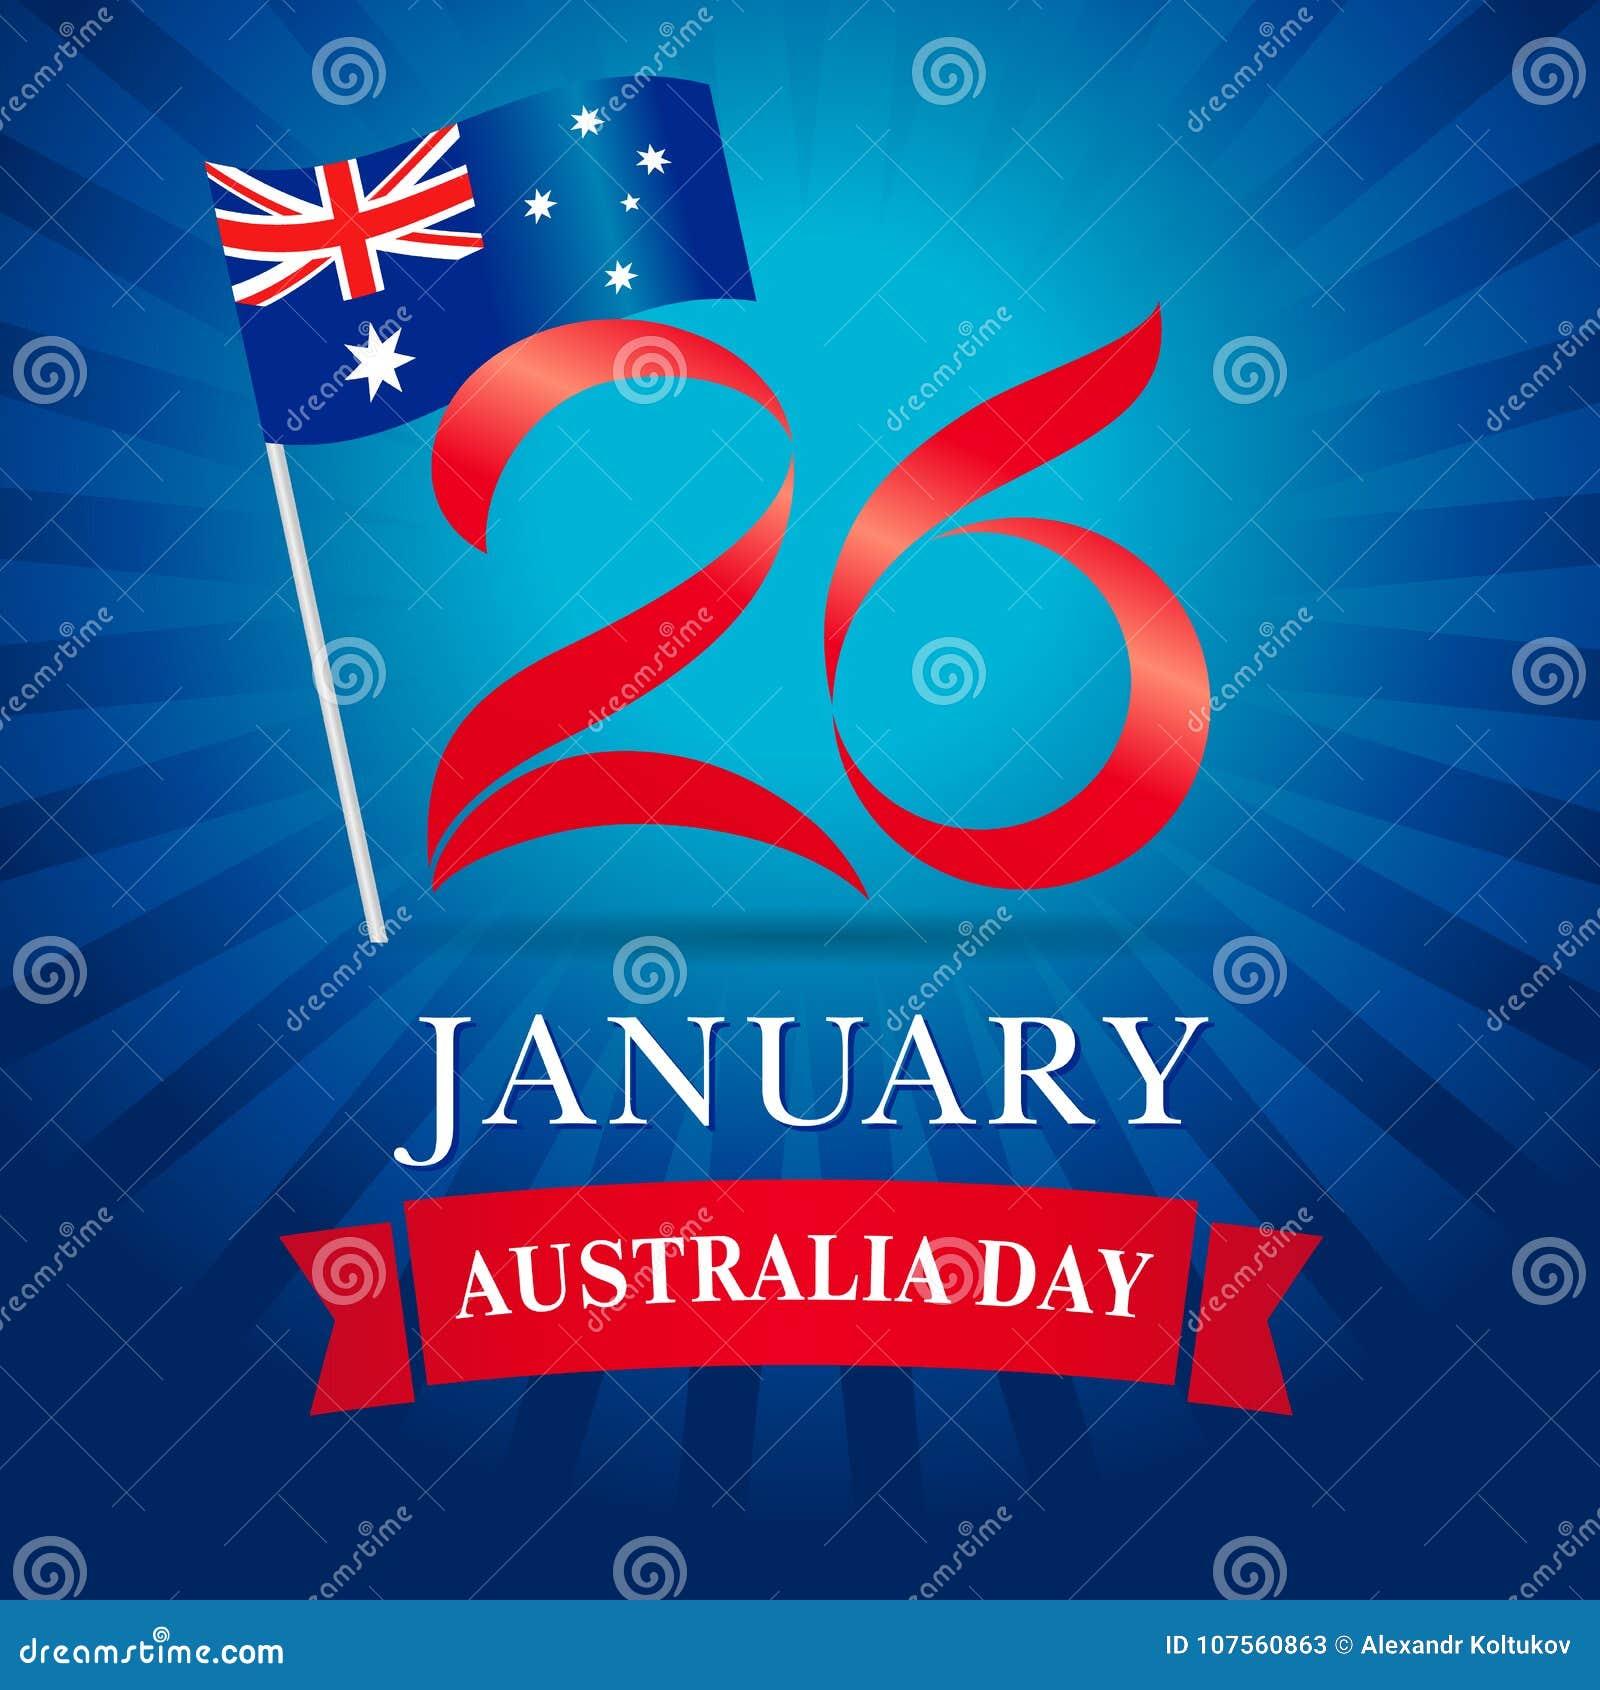 26 January Happy Australia Day Greeting Card Blue Stock Vector